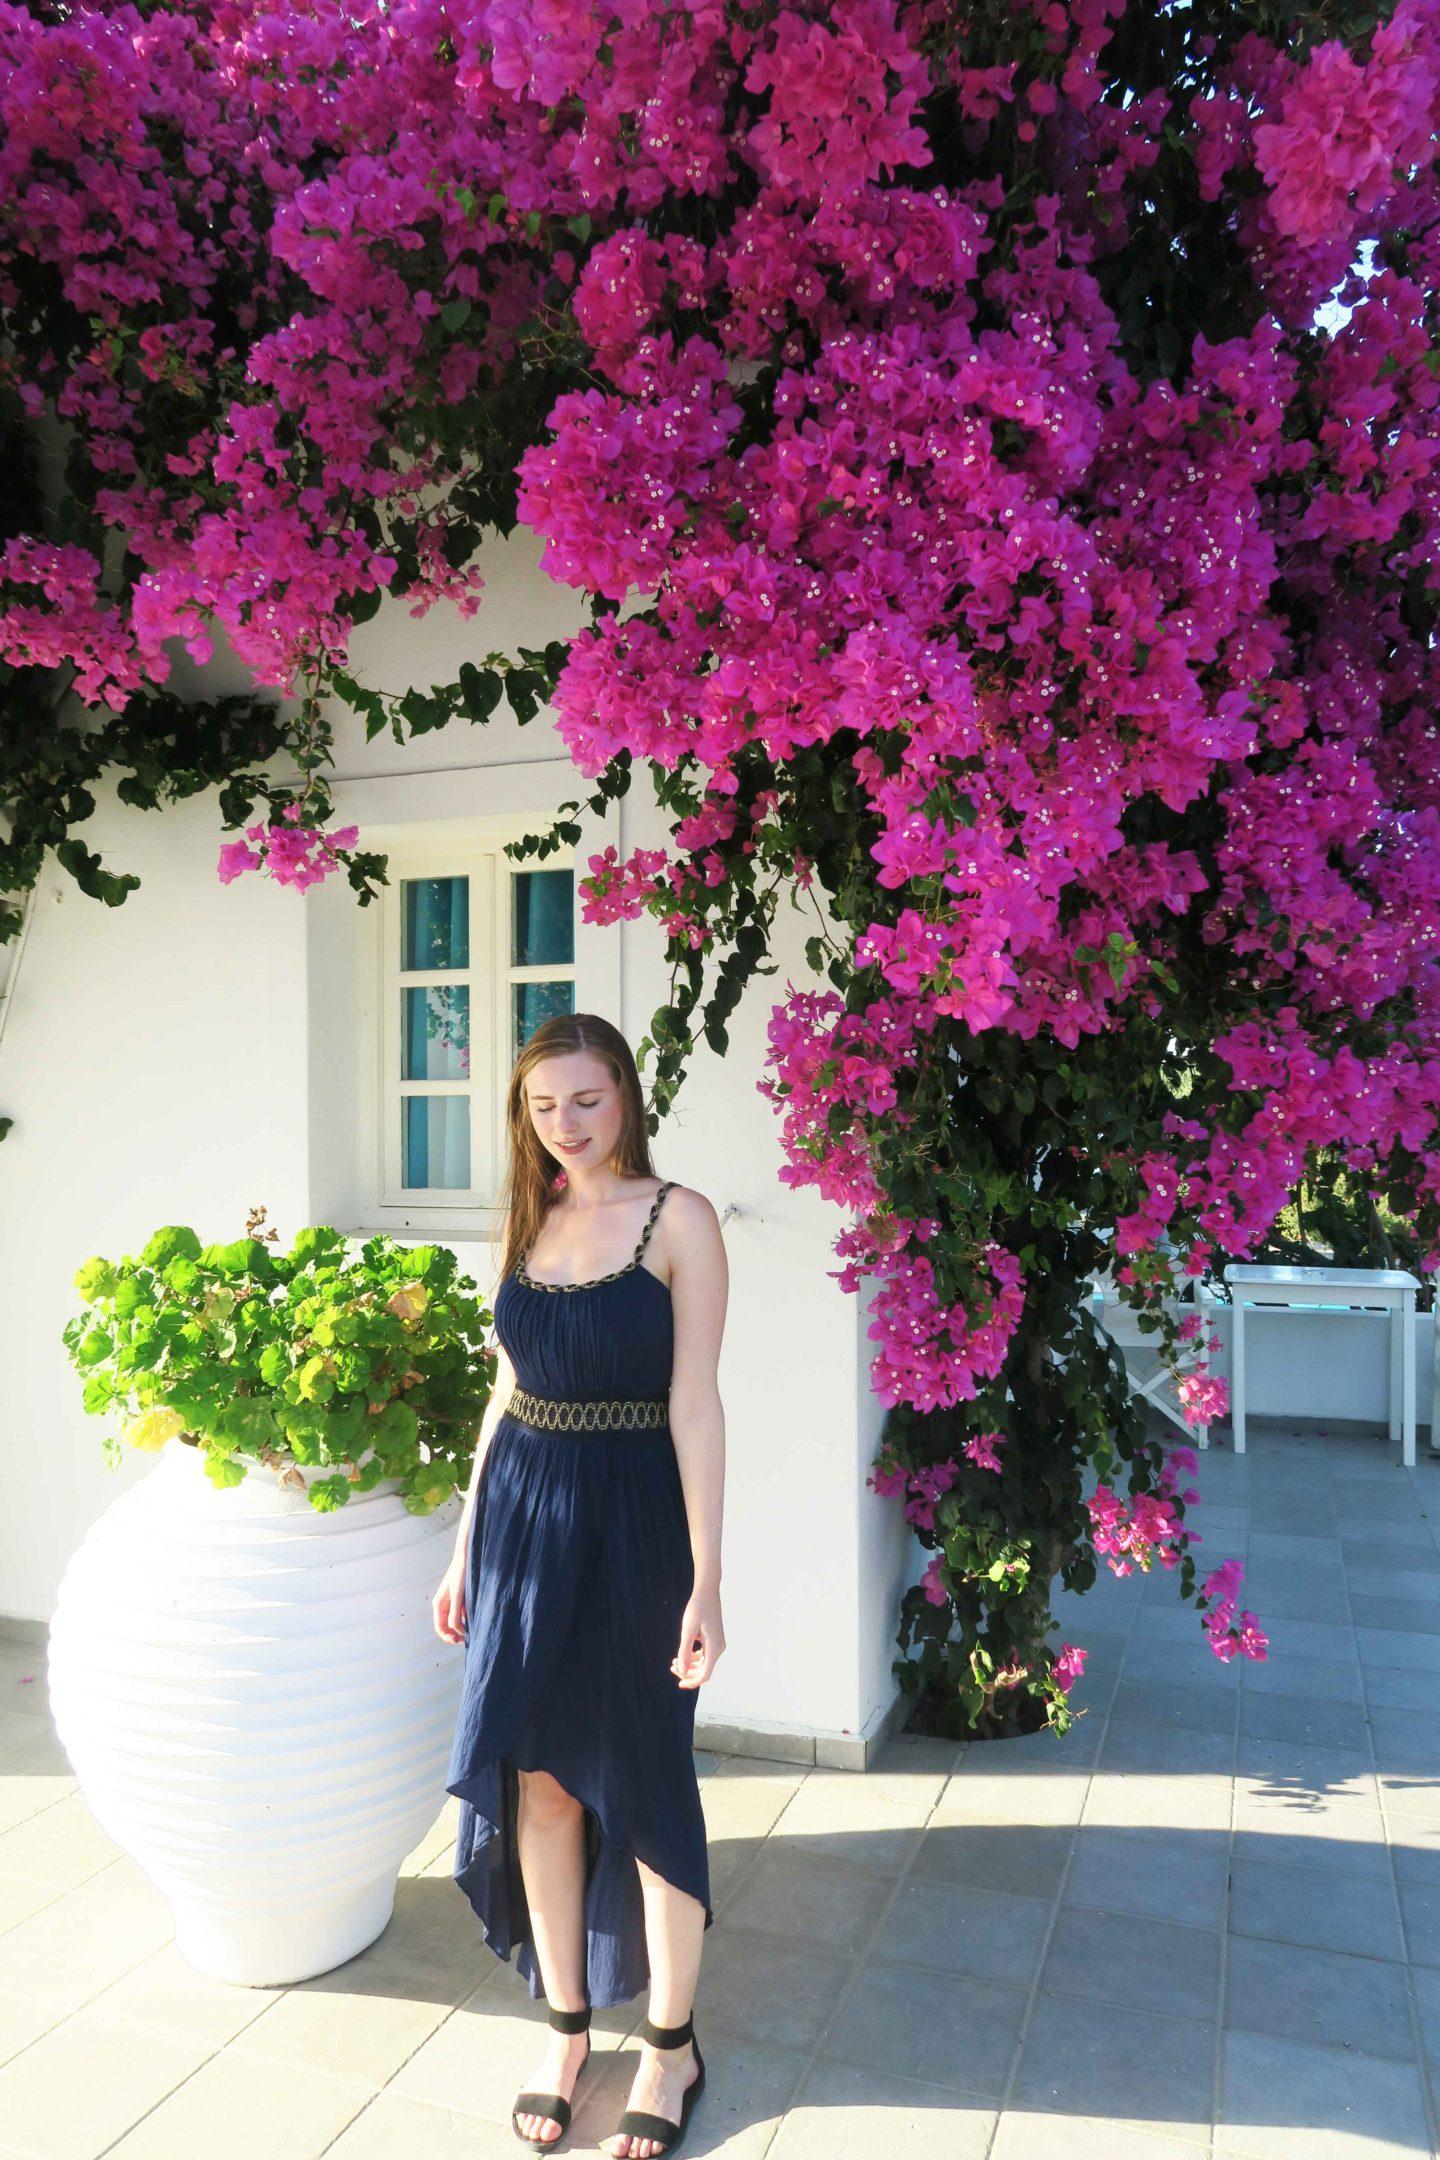 santorini greek dress pink flowers